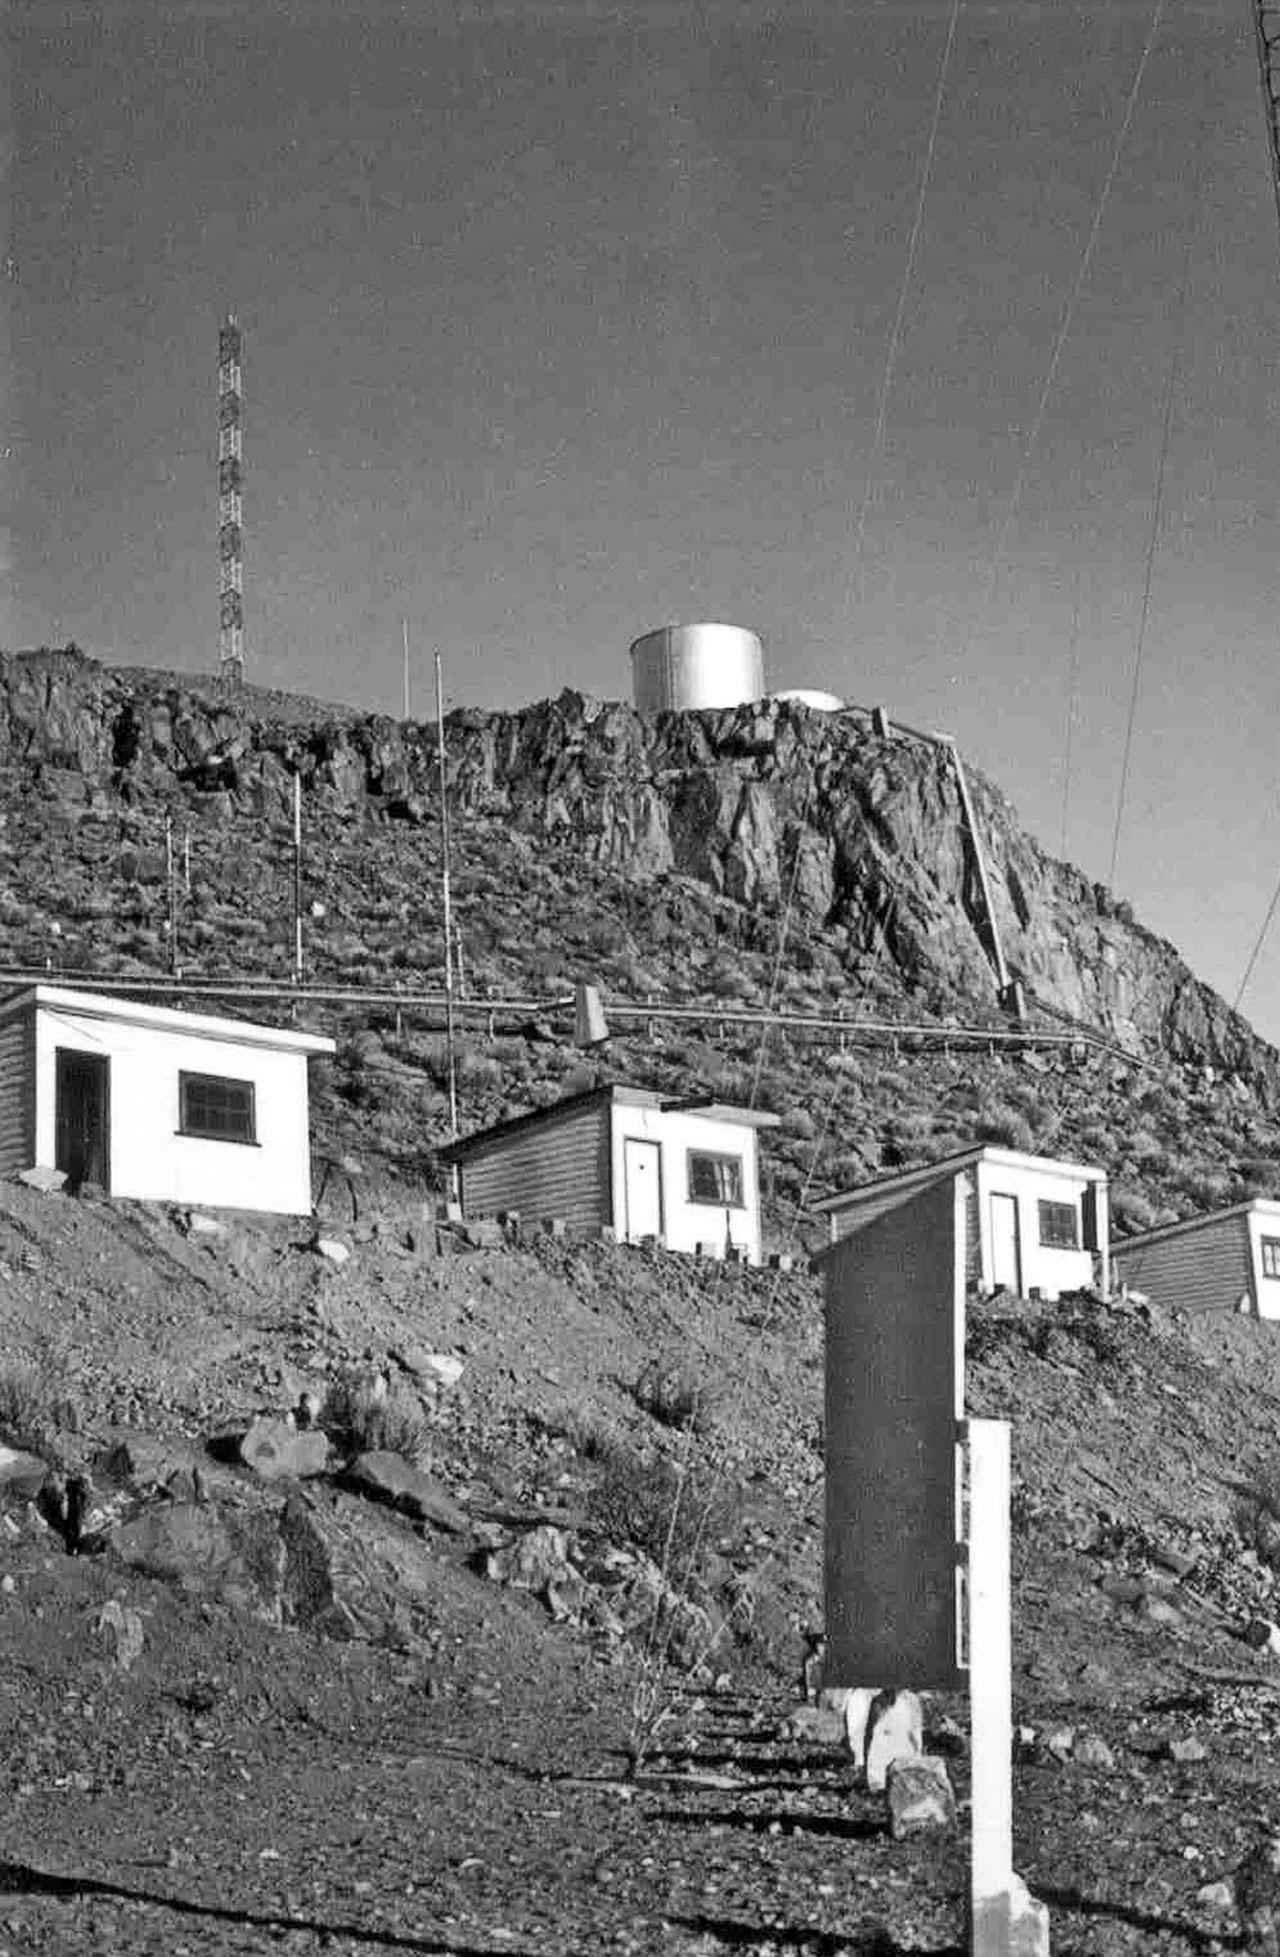 La Silla observatory under construction